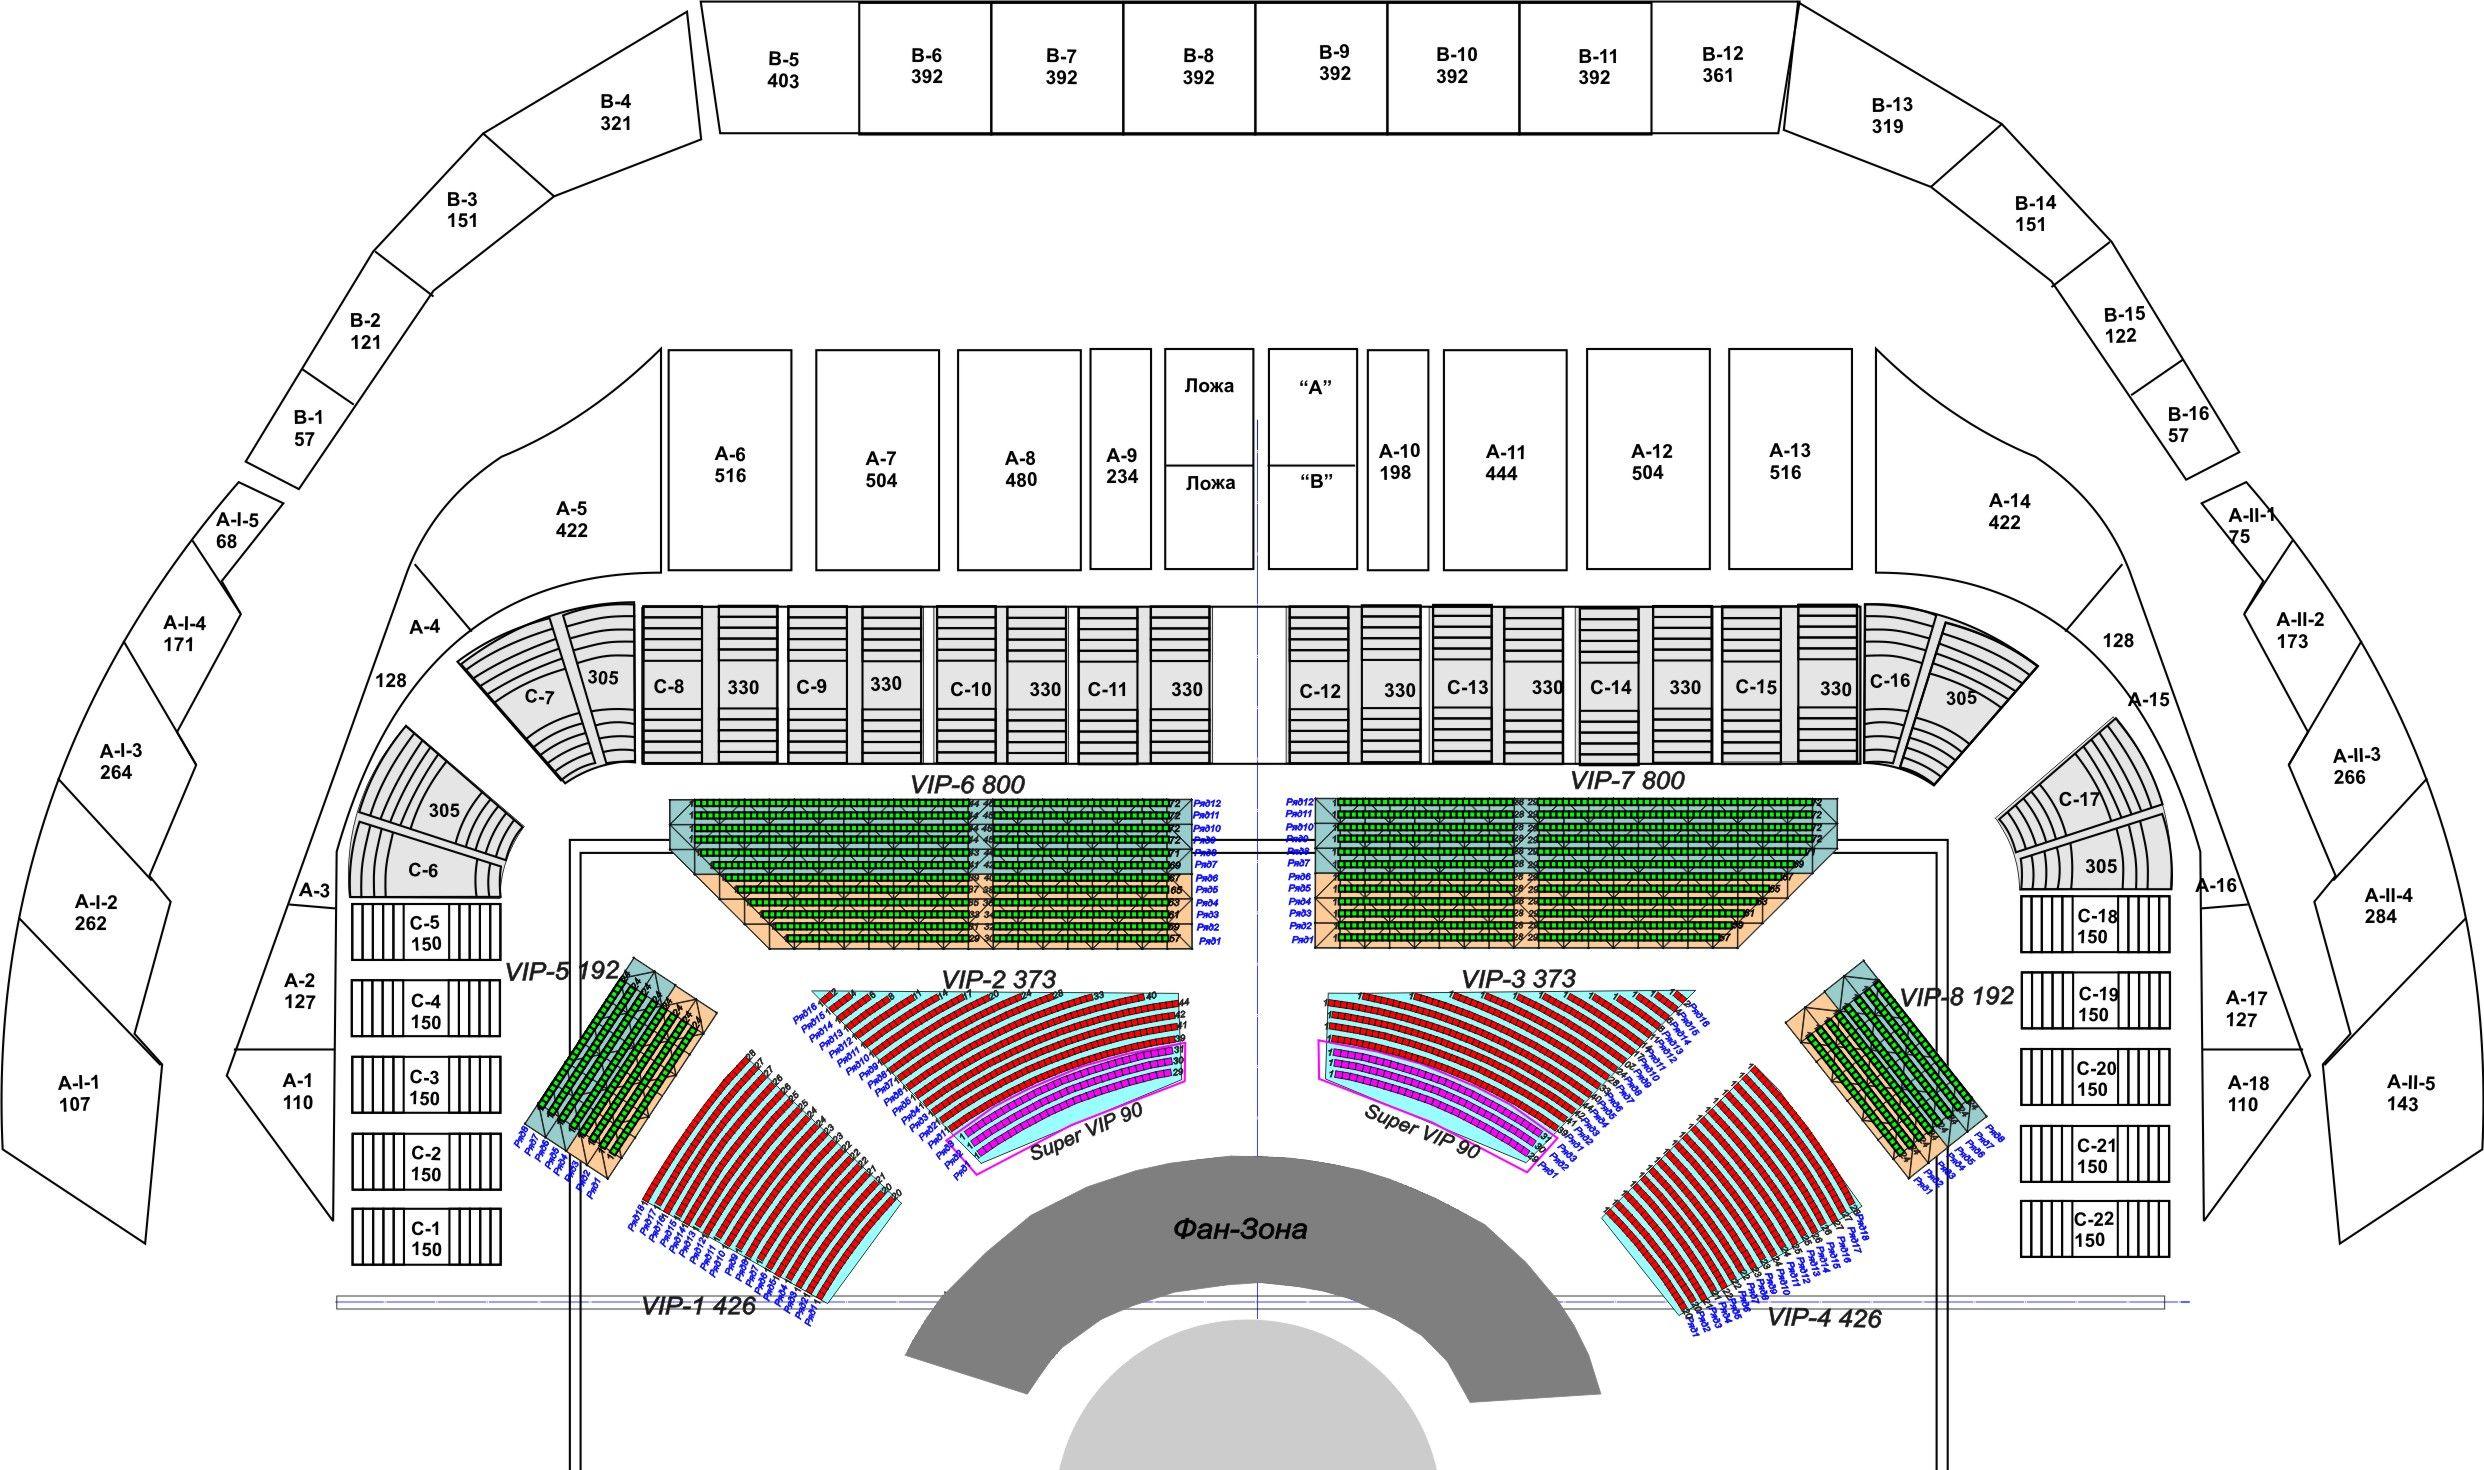 схема зала олимпийского с местами